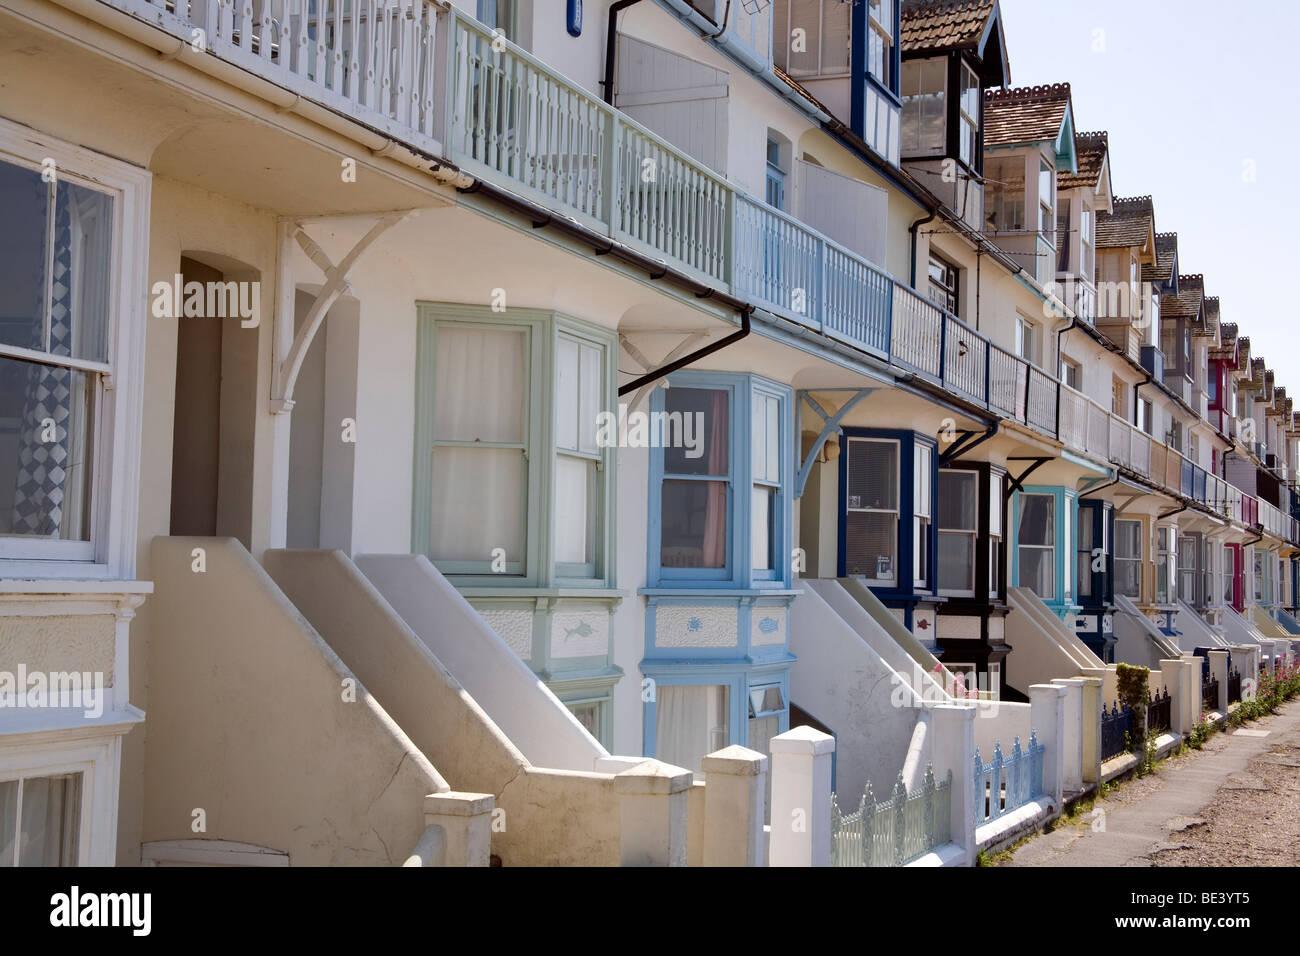 Hilera de casas adosadas en la playa Whitstable Kent, UK Imagen De Stock